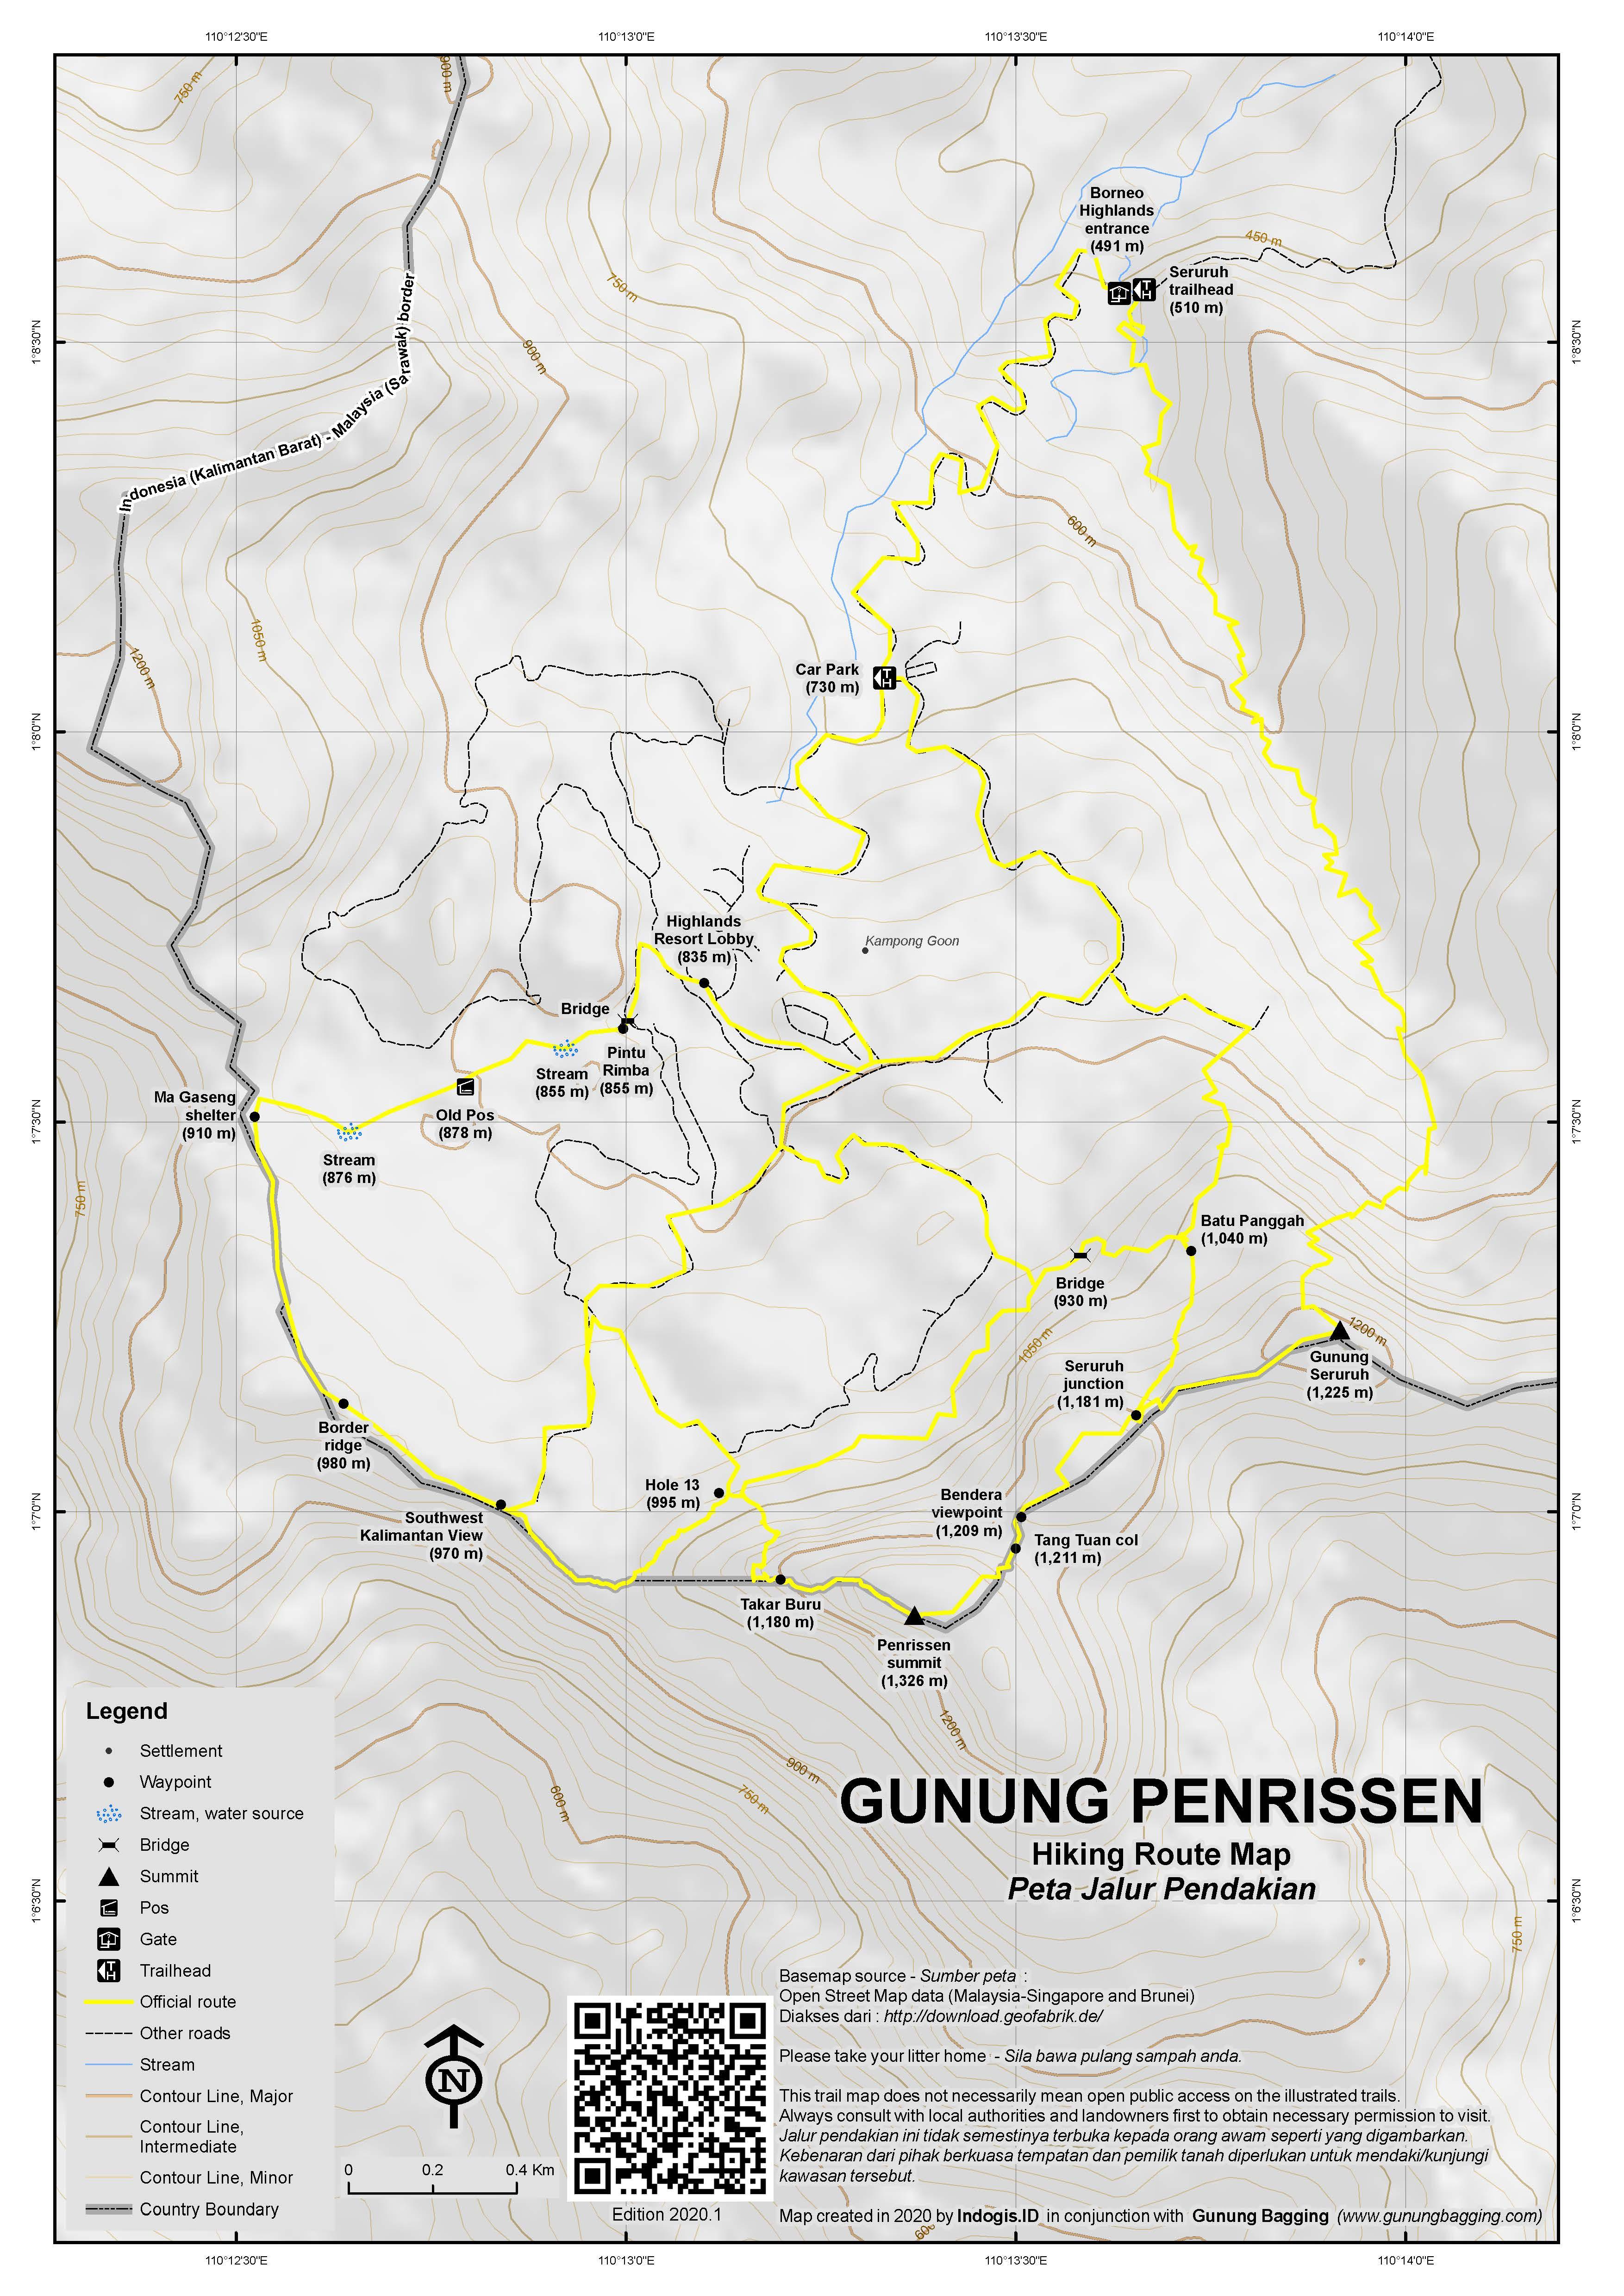 Peta Jalur Pendakian Gunung Penrissen